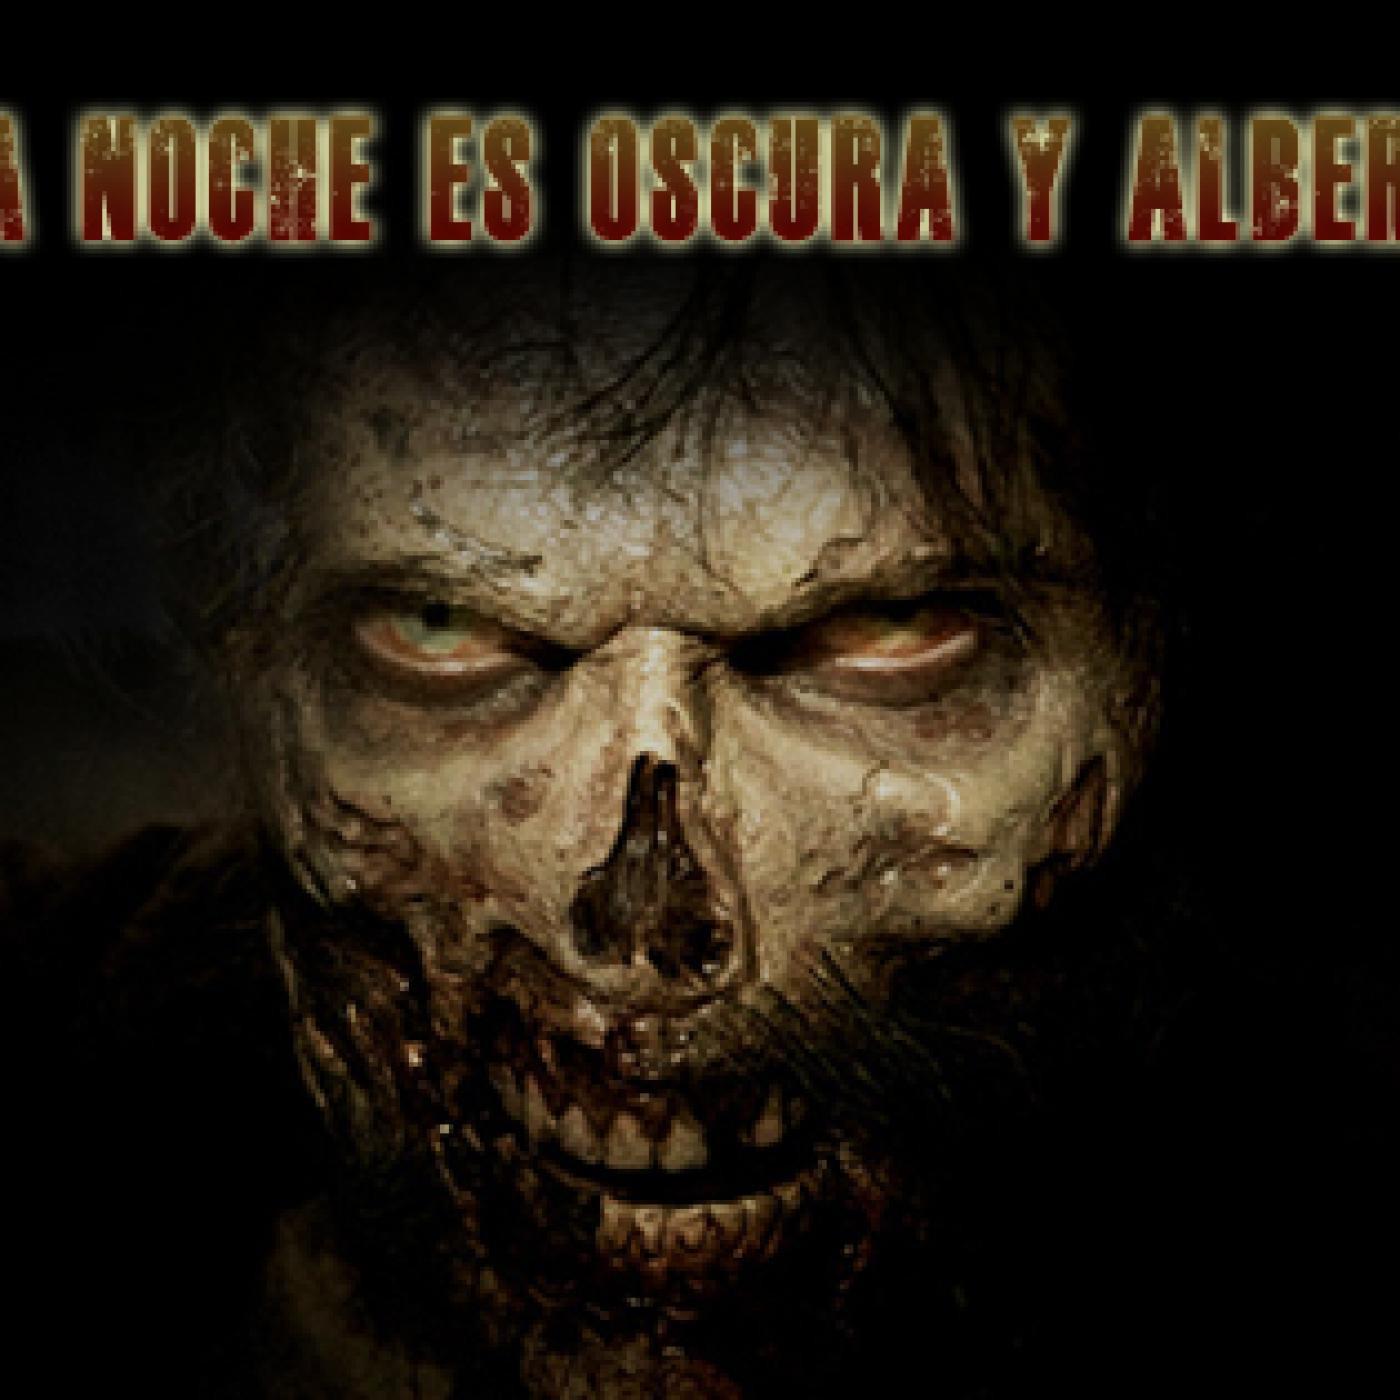 La Constante 1x07 Fear The Walking Dead 1x6 The Good Man - The Walking Dead 5x16 Vence - Doctor Who - Regreso al Futuro